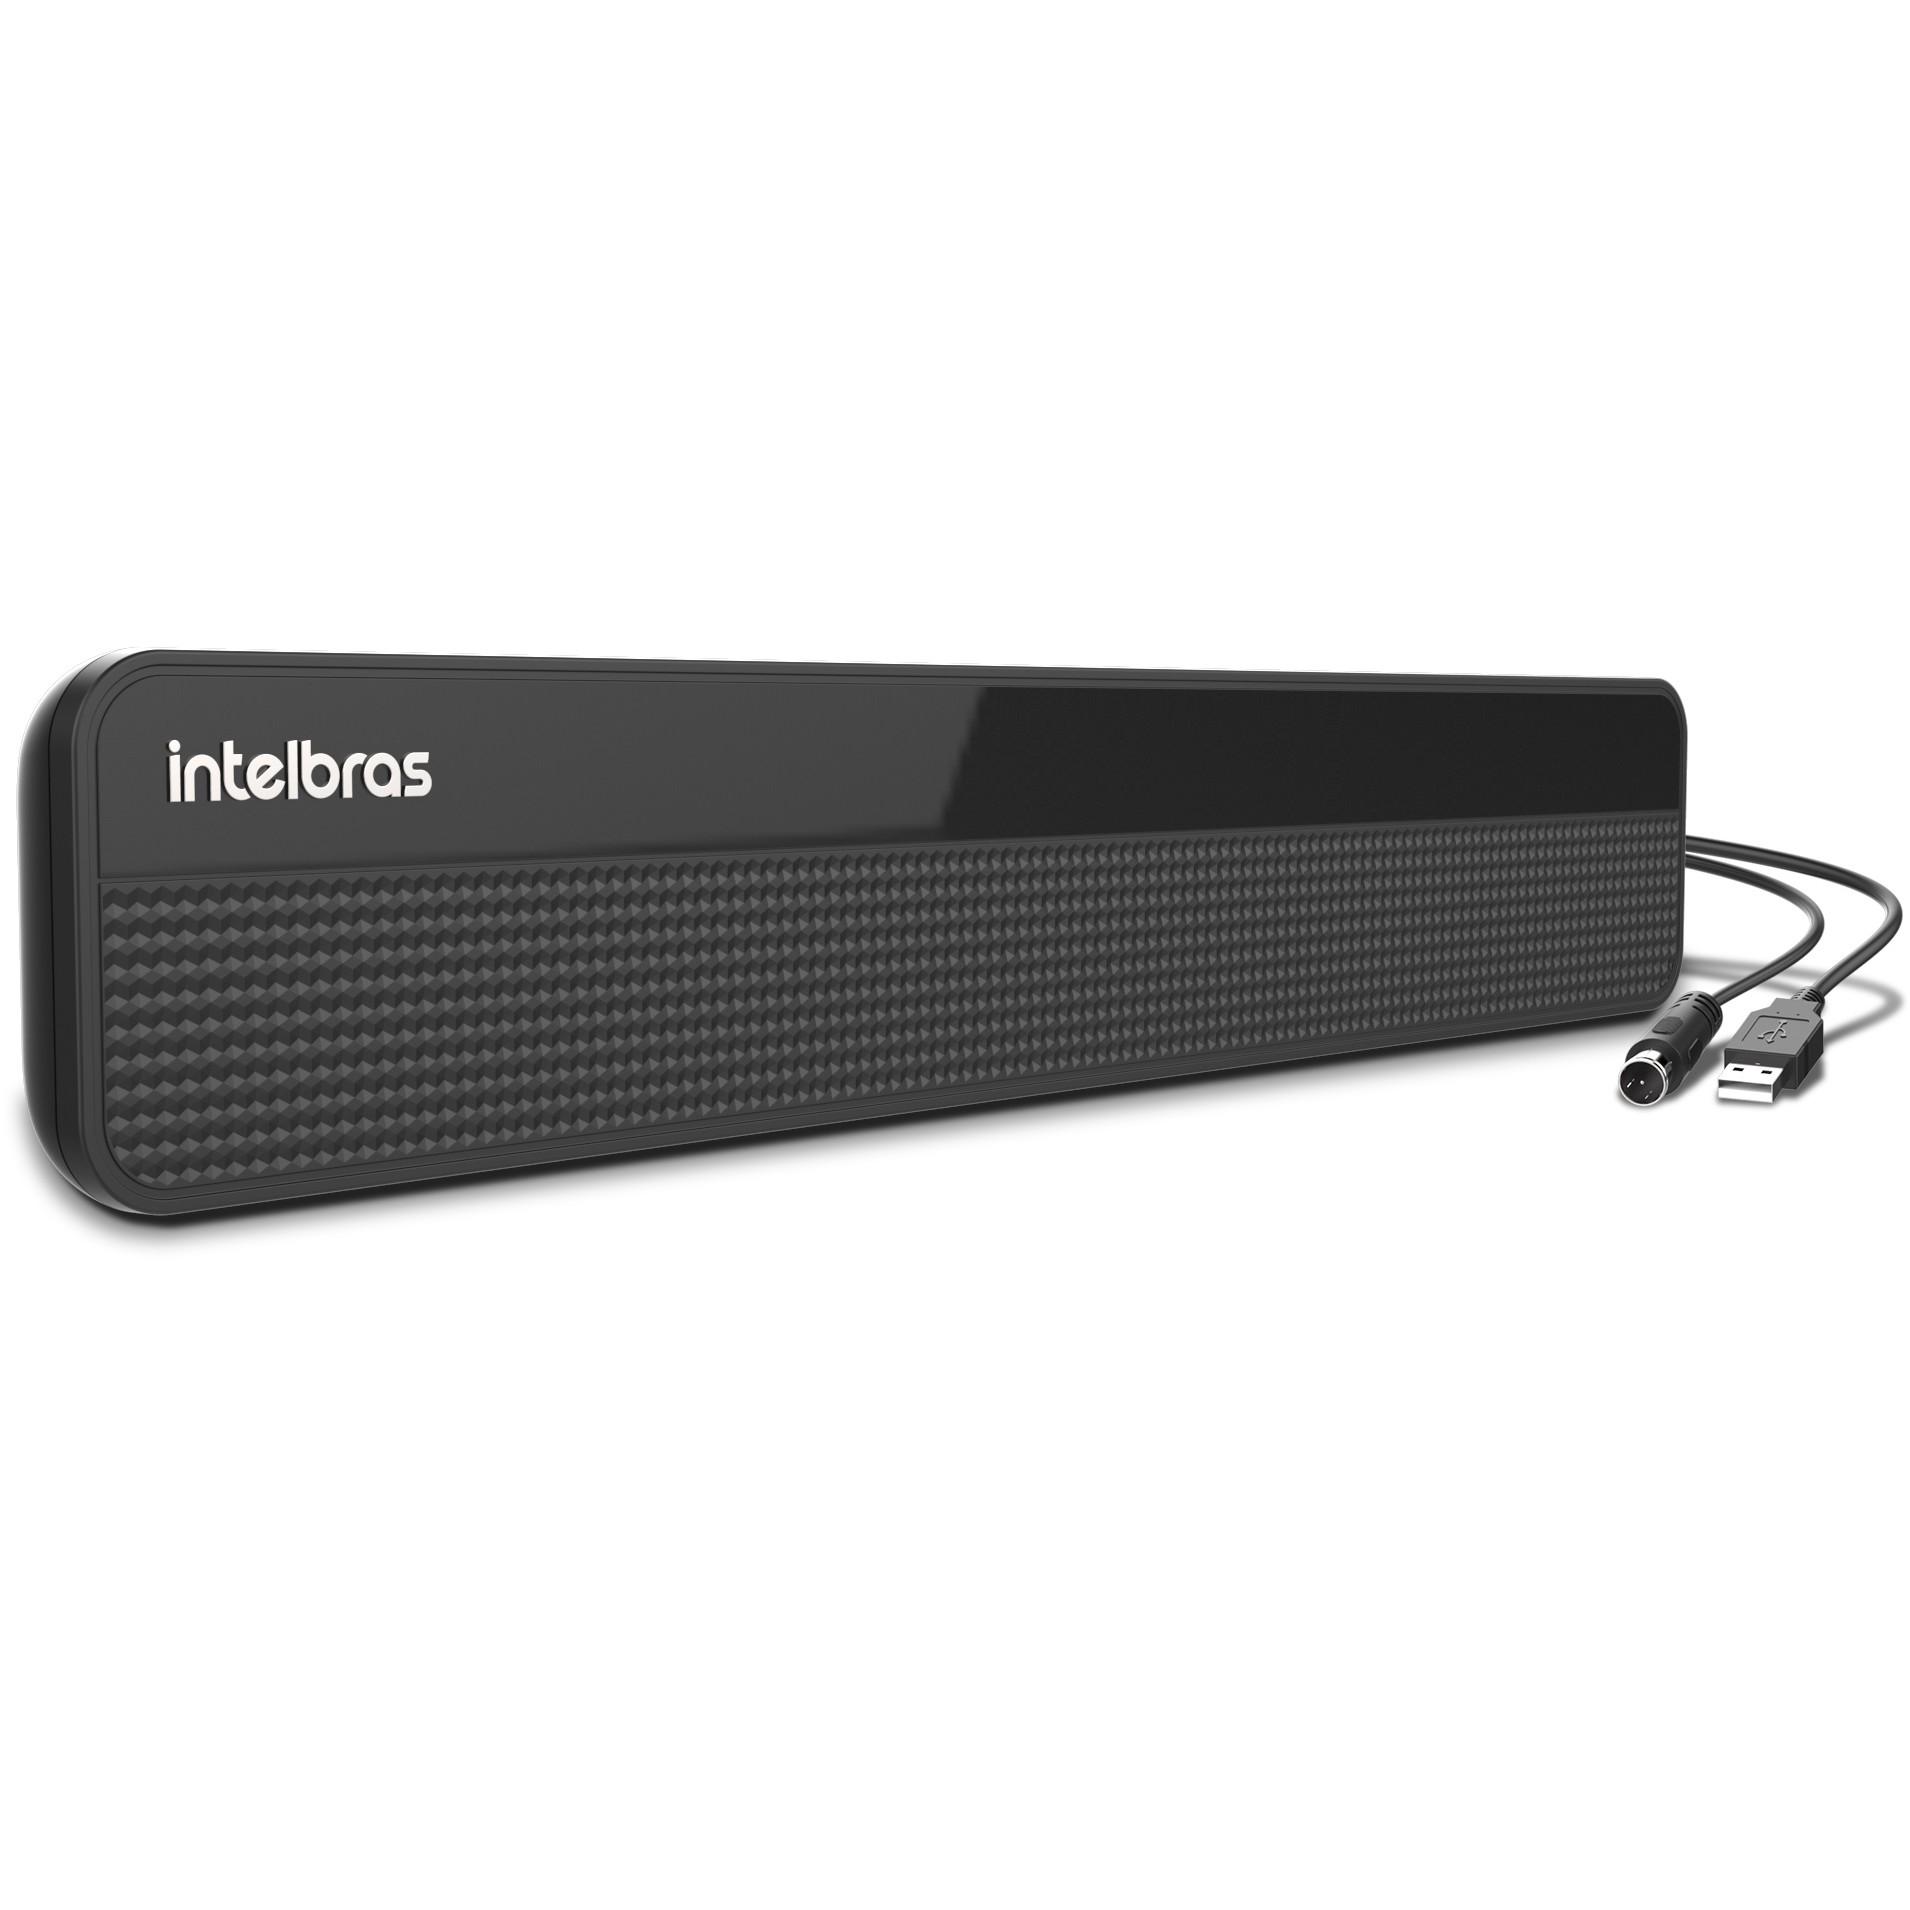 Antena Interna UHFHDTV com Amplificada - Ai3101 - Intelbras